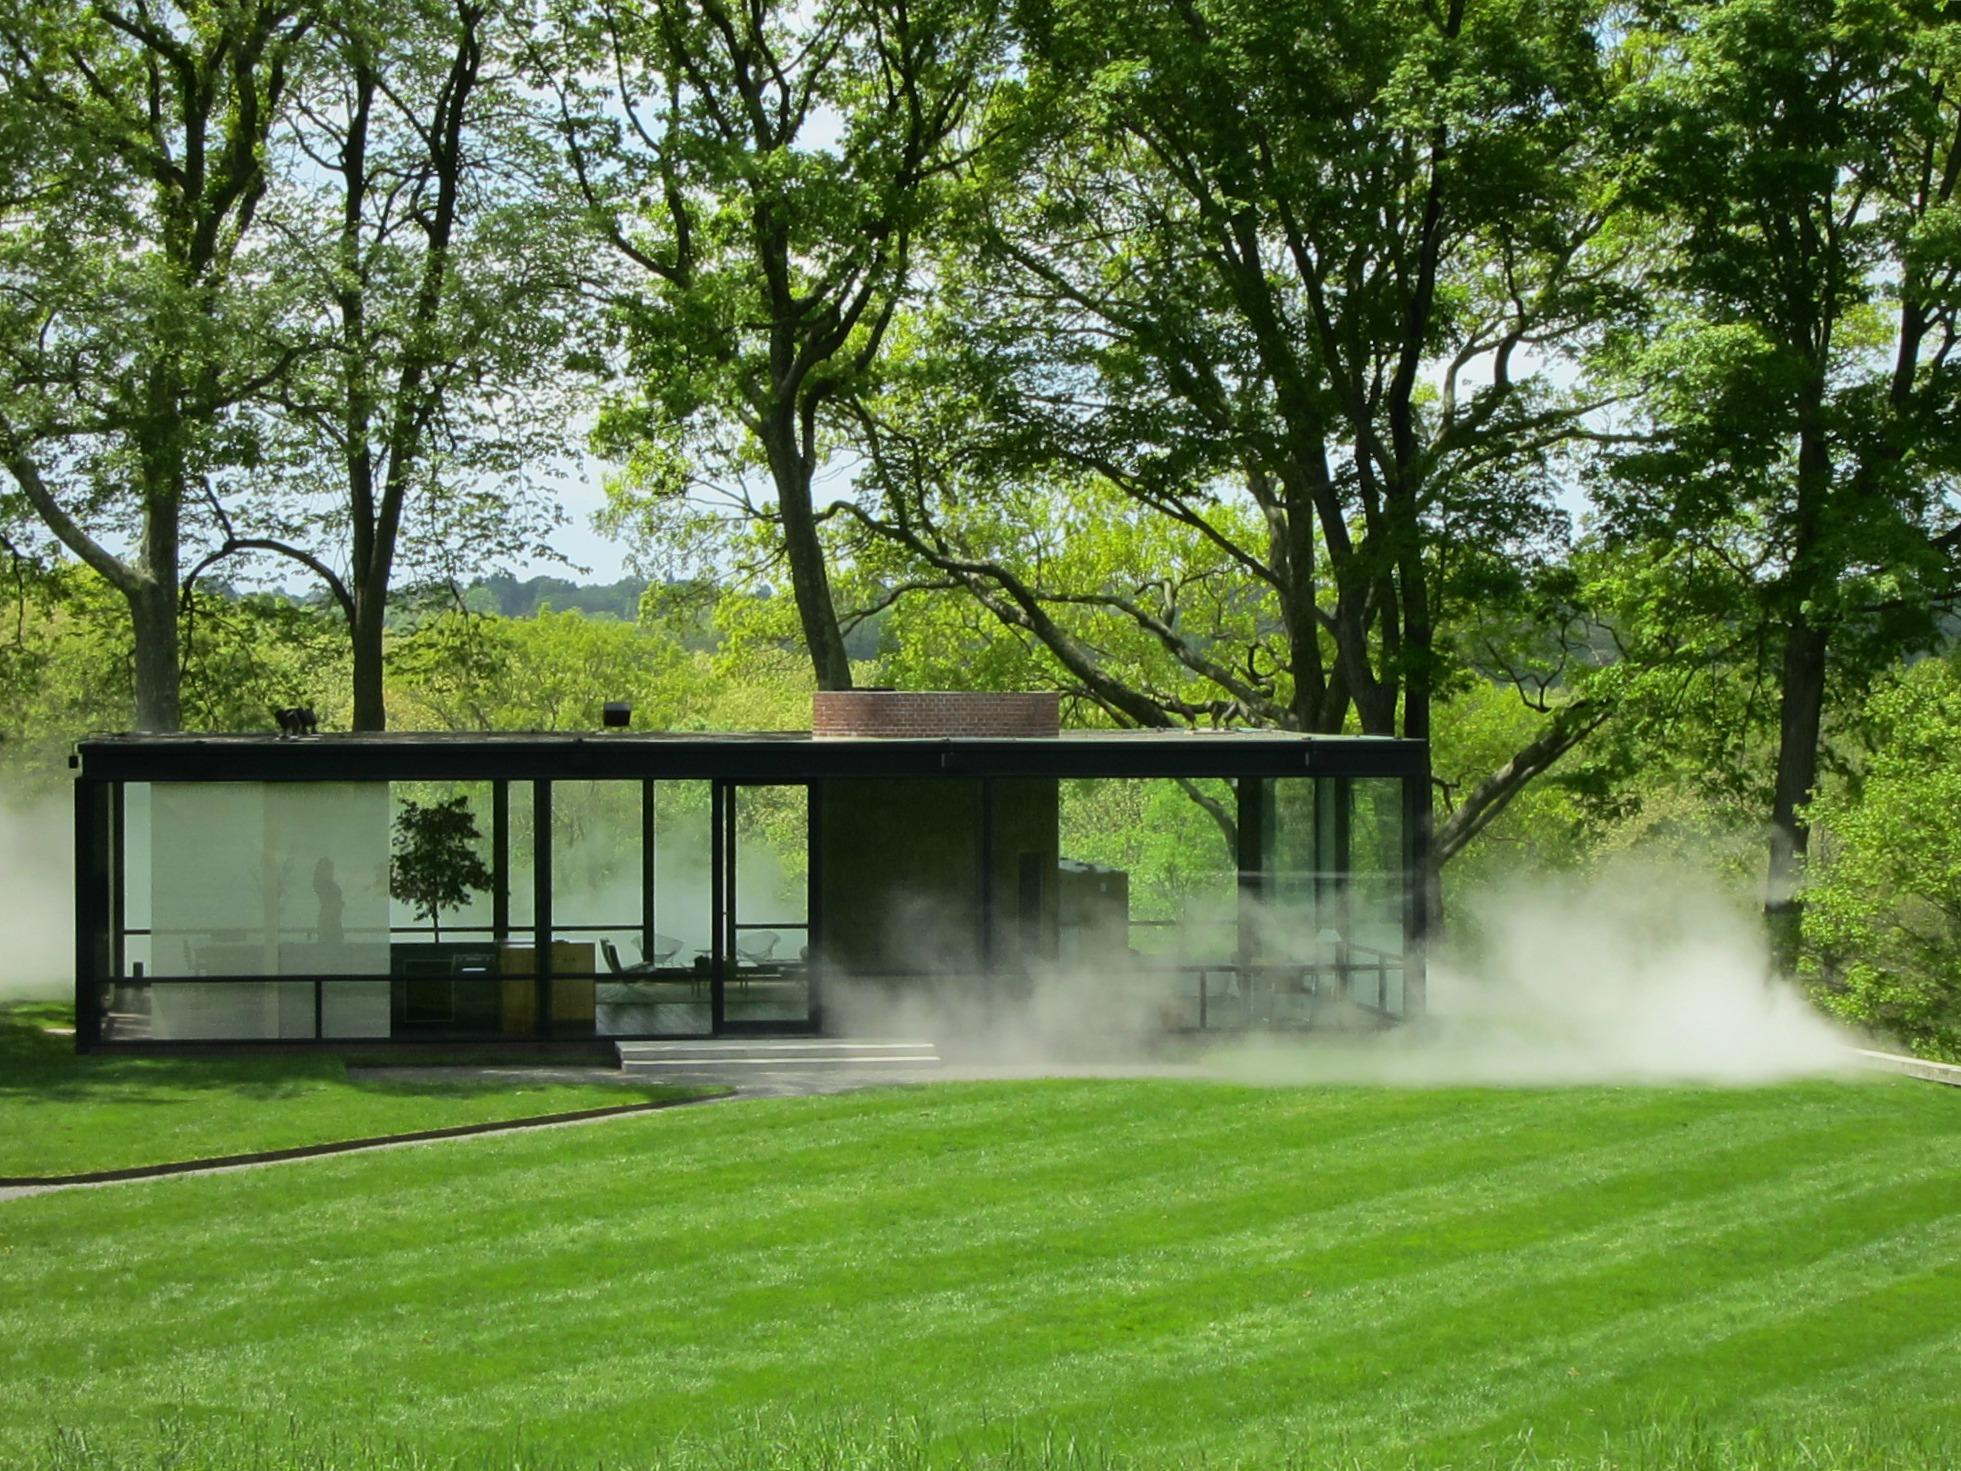 Visit the philip johnson glass house a fine prospect - Philip johnson glass house ...